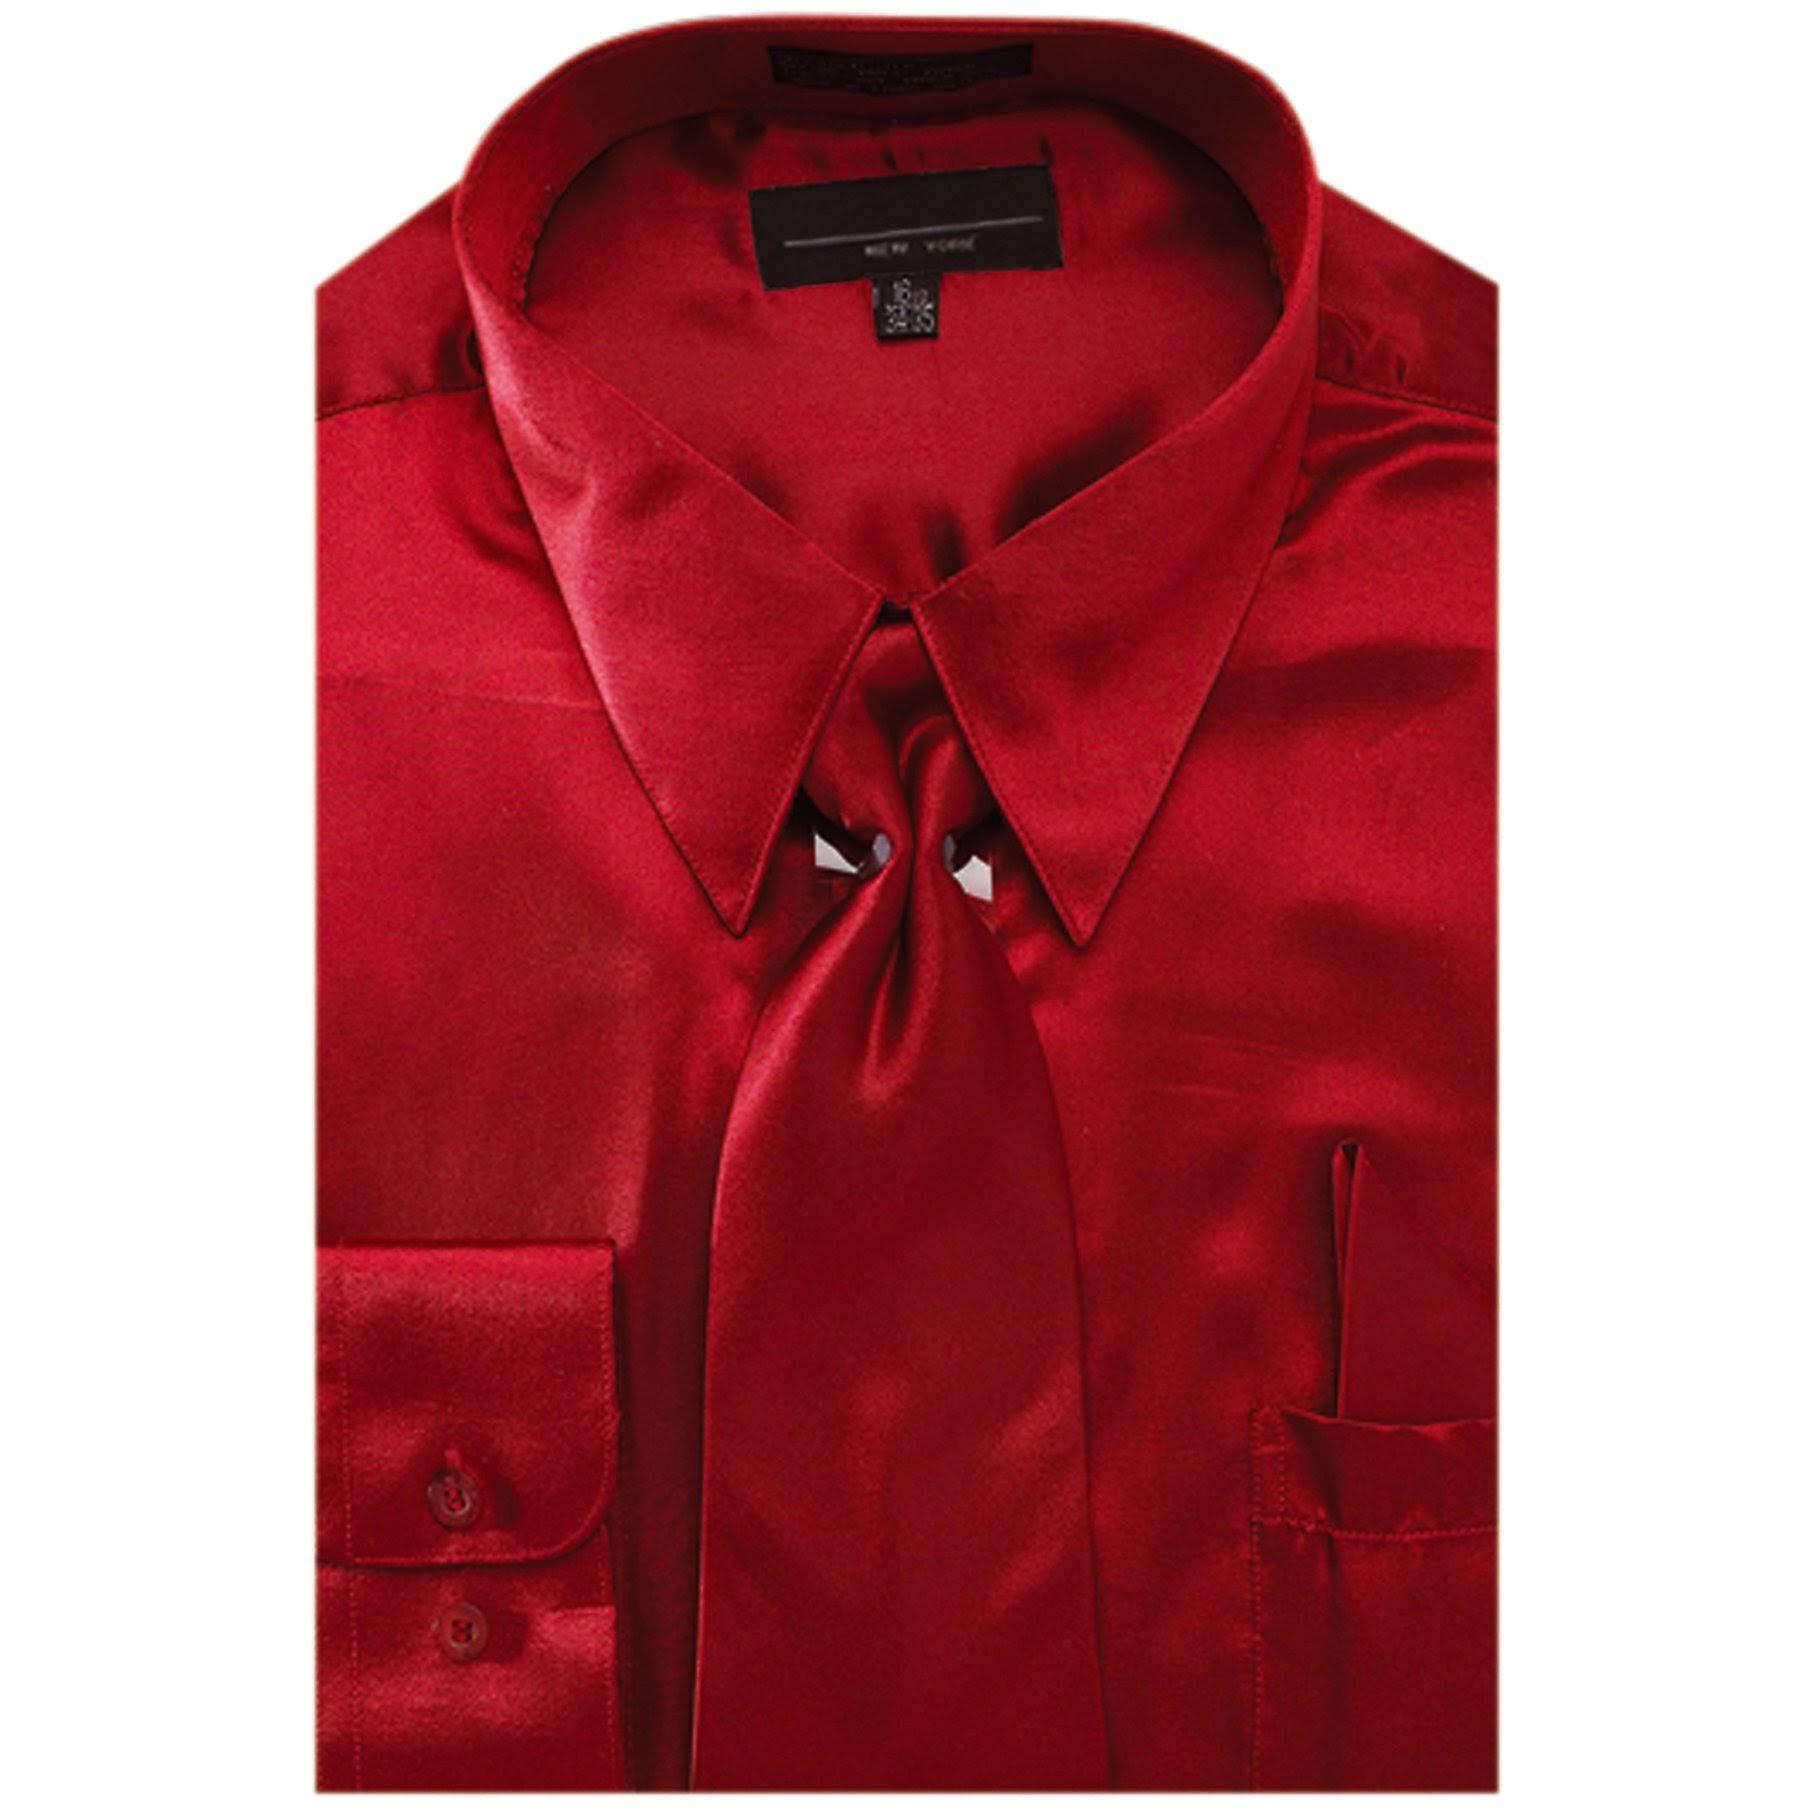 Pañuelo 3536 Ntp En bur Satén ds3012np2 Camisa Y 205 De Vestir Hombres Outlet Burdeos Color Para Liso Sunrise Corbata XTOqw7O